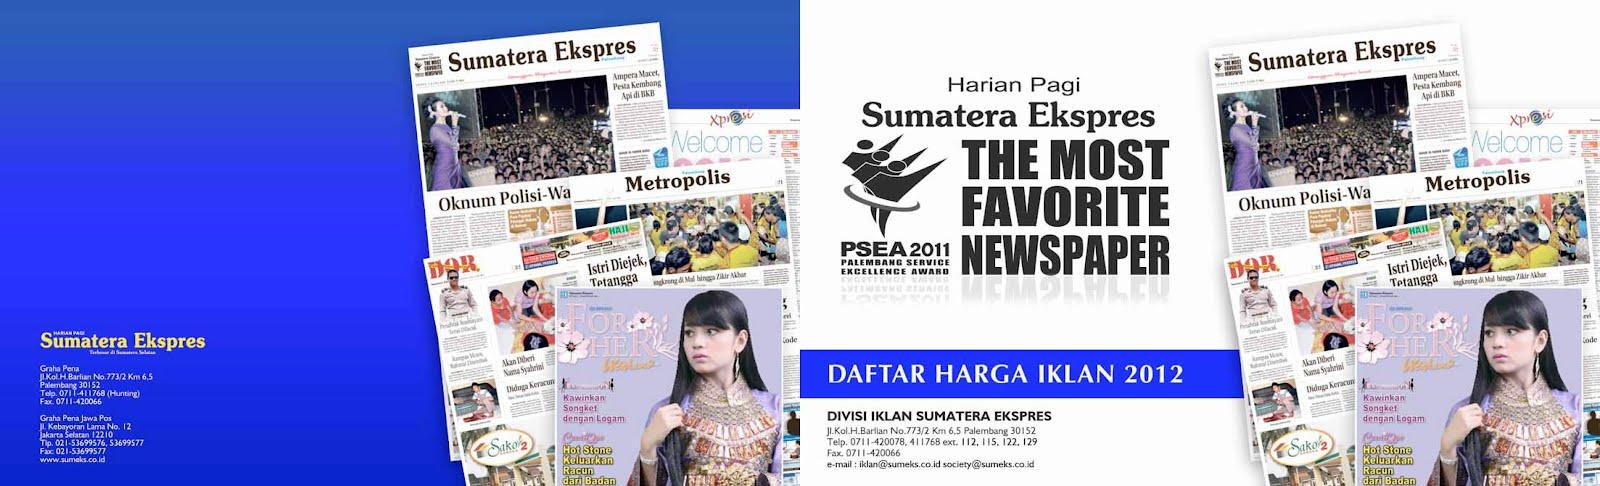 Sumatera Ekspres